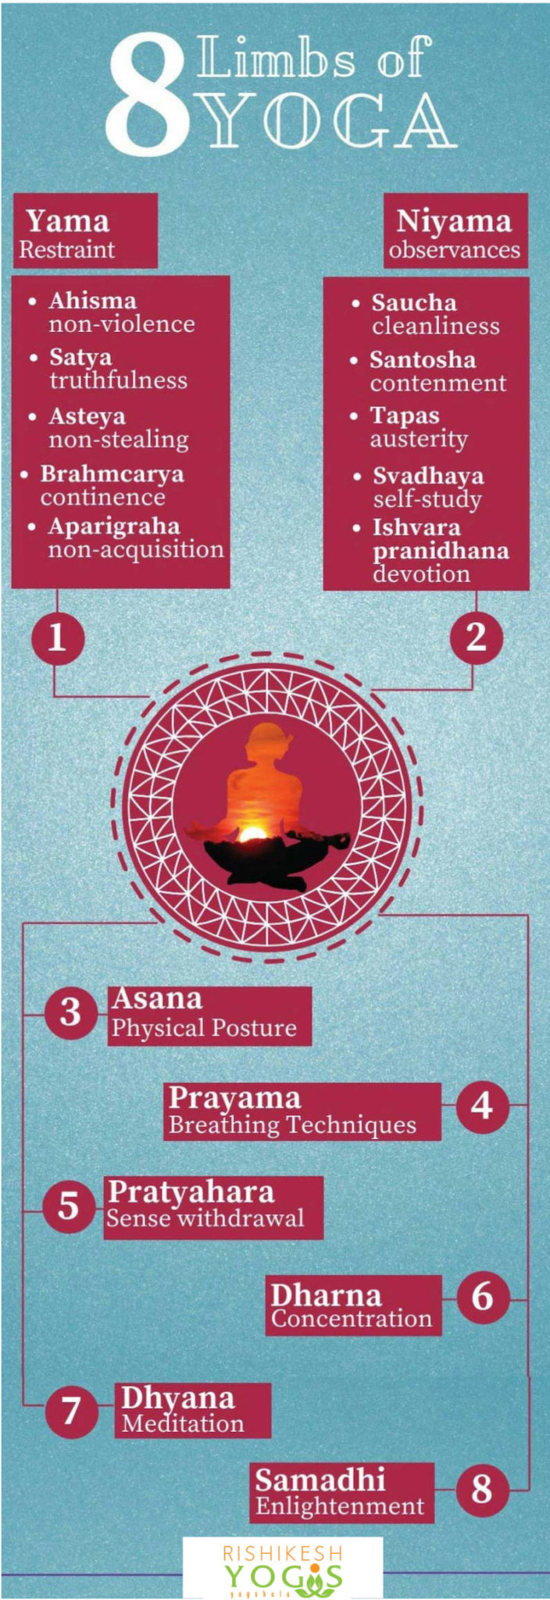 8 limbs of yoga chart